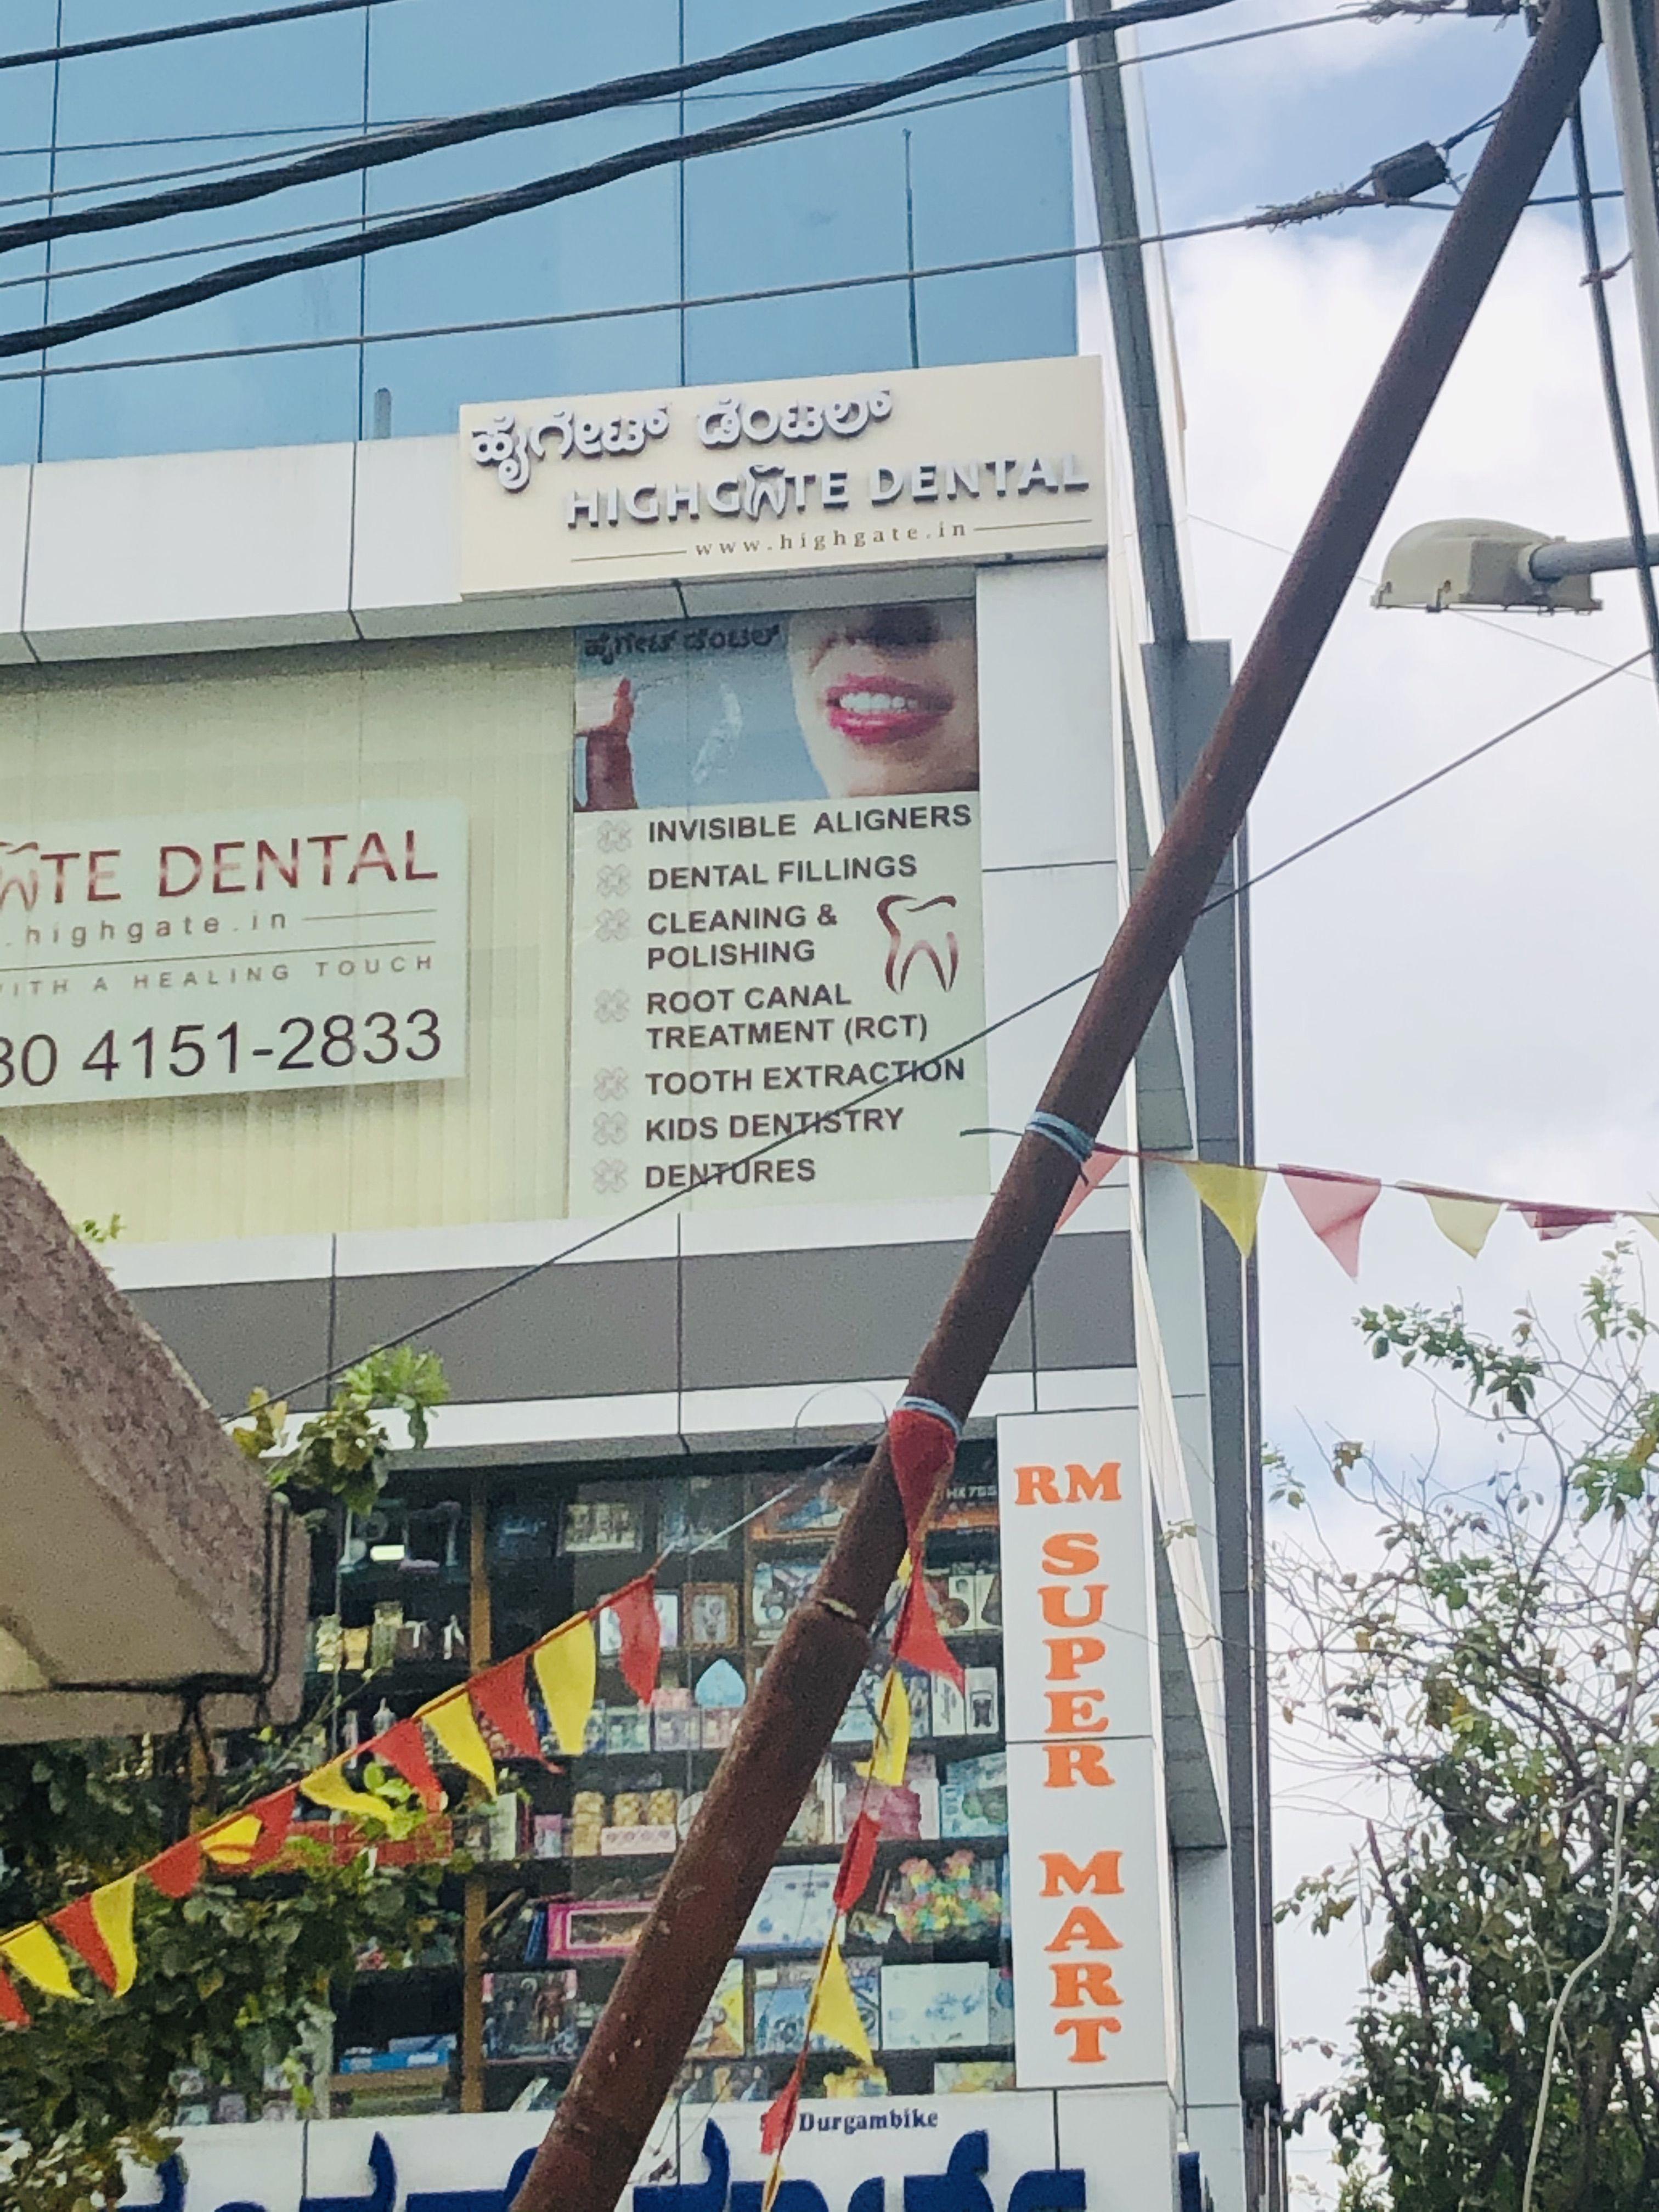 Best Dentist near Bannerghatta Road | Highgate Dental Centre Bilekahalli